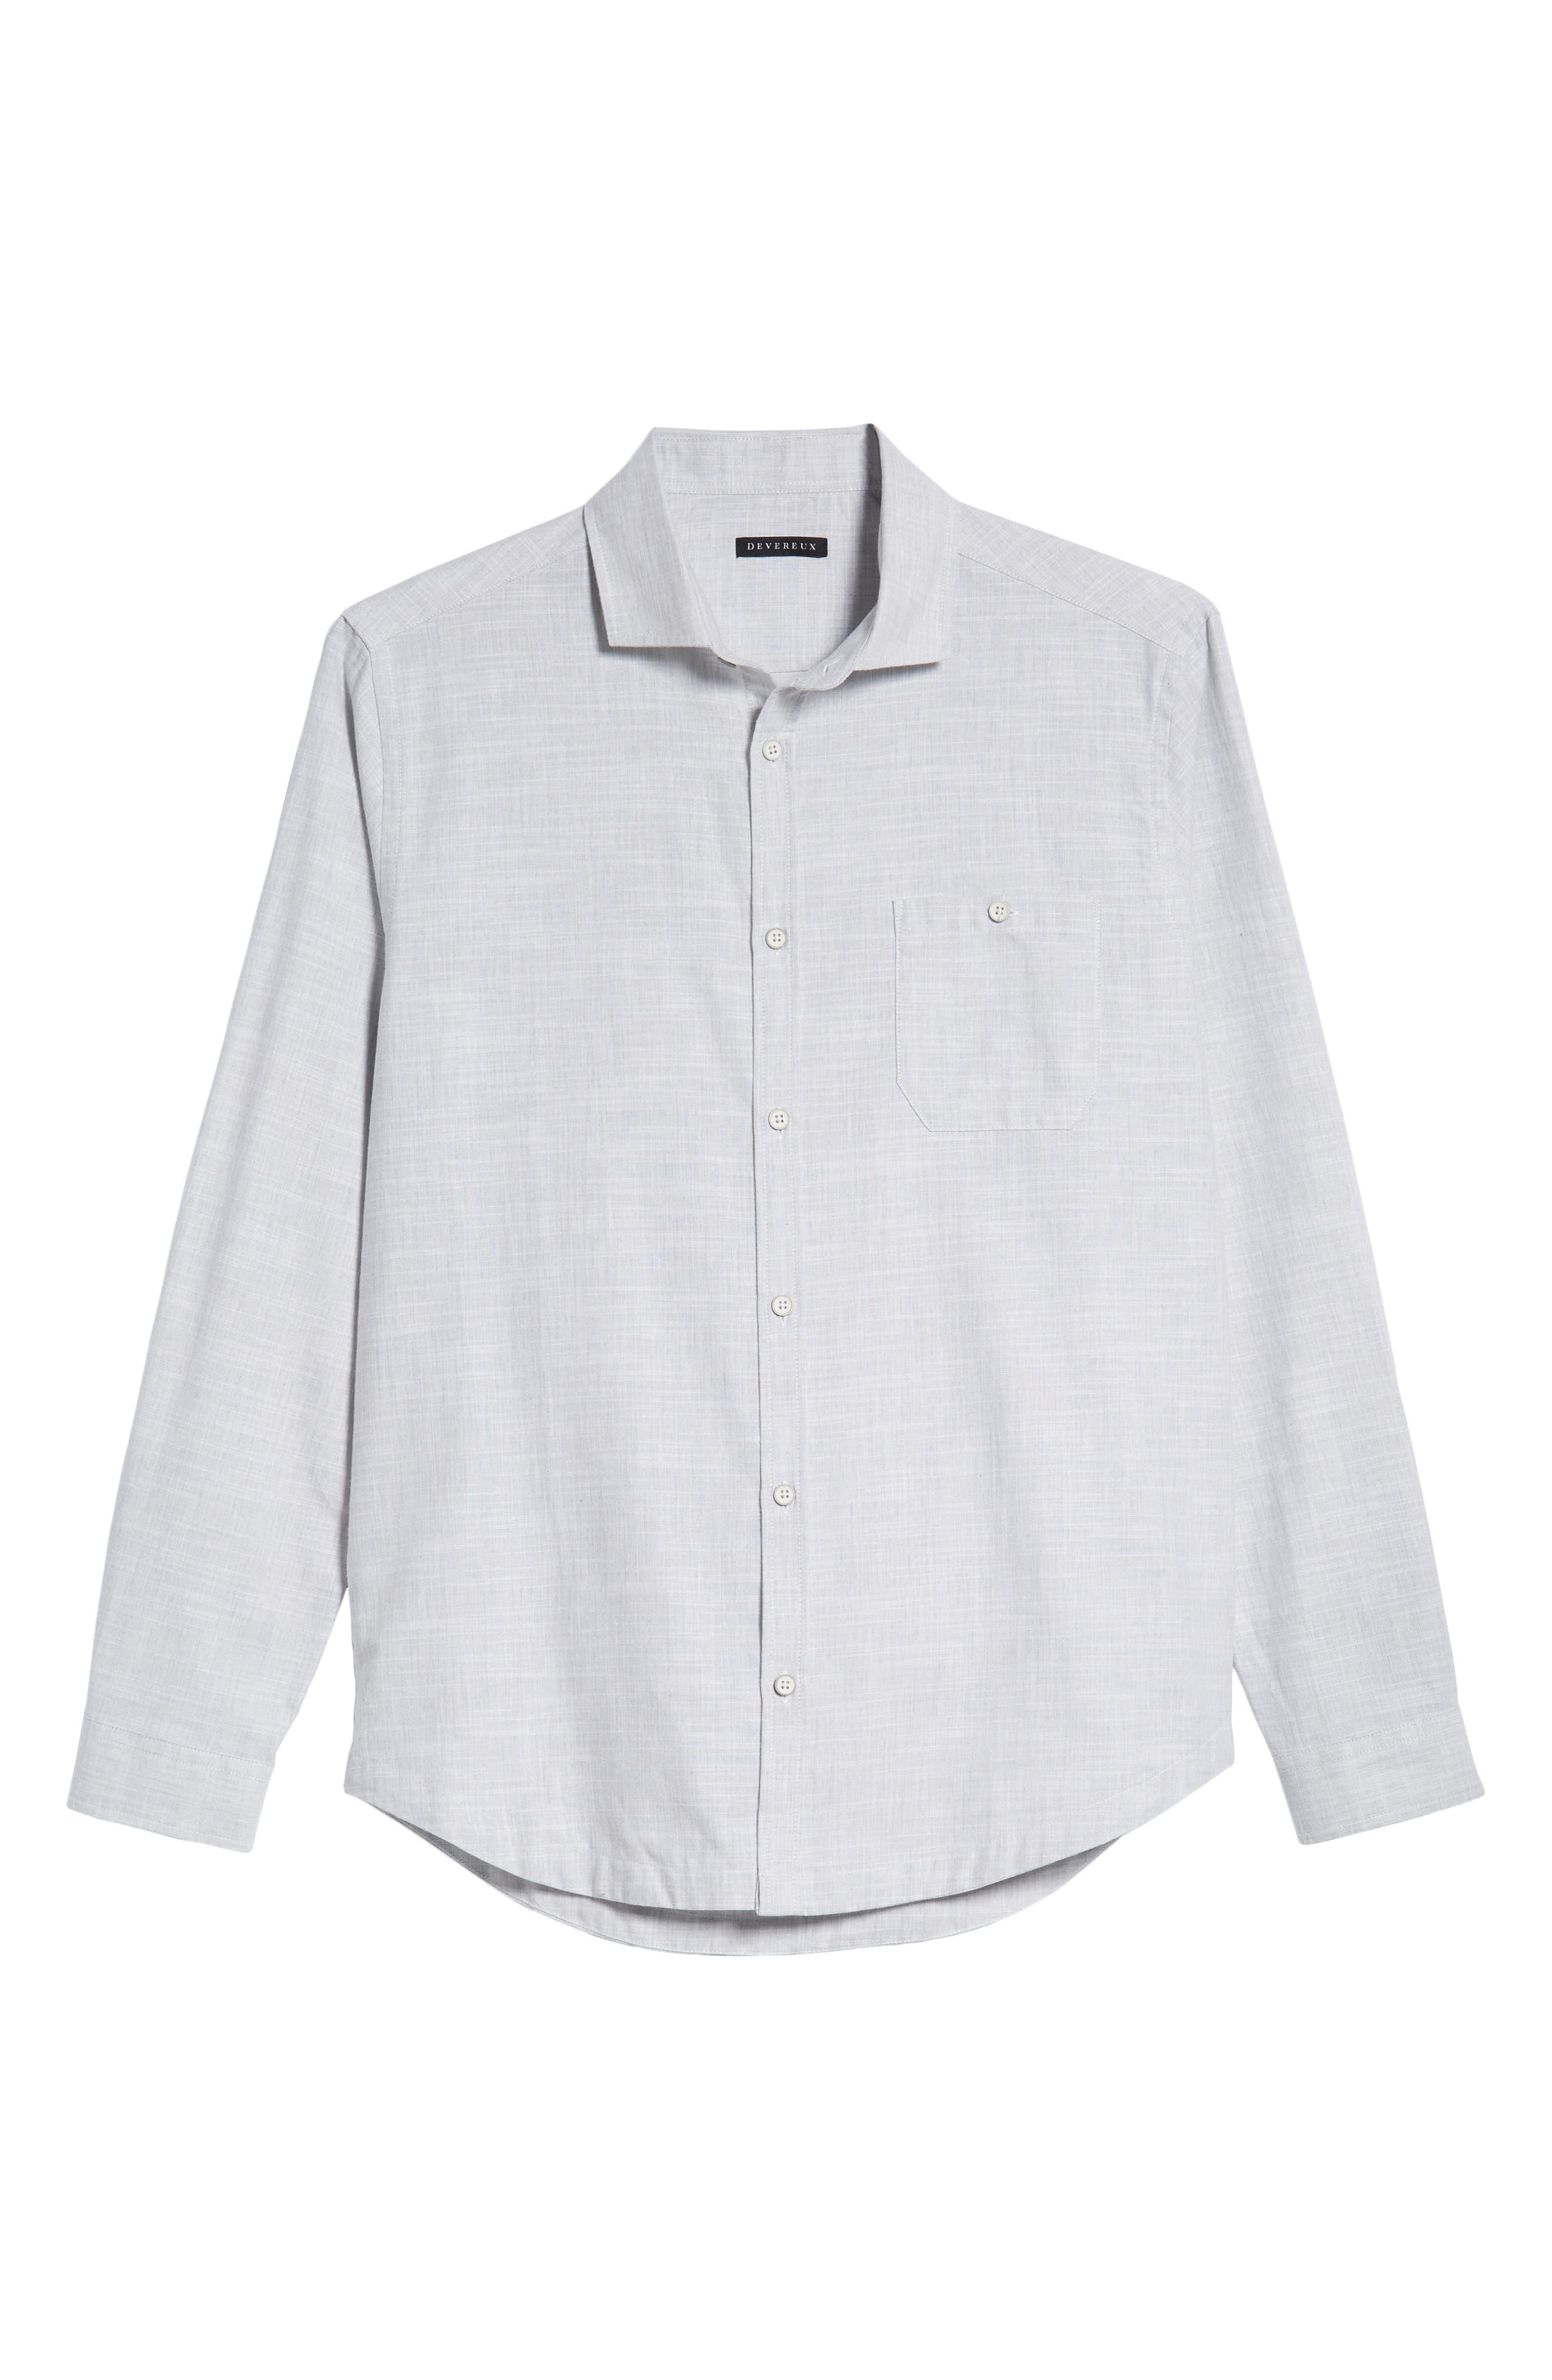 Rugger Regular Fit Sport Shirt,                             Alternate thumbnail 5, color,                             LIGHT GREY